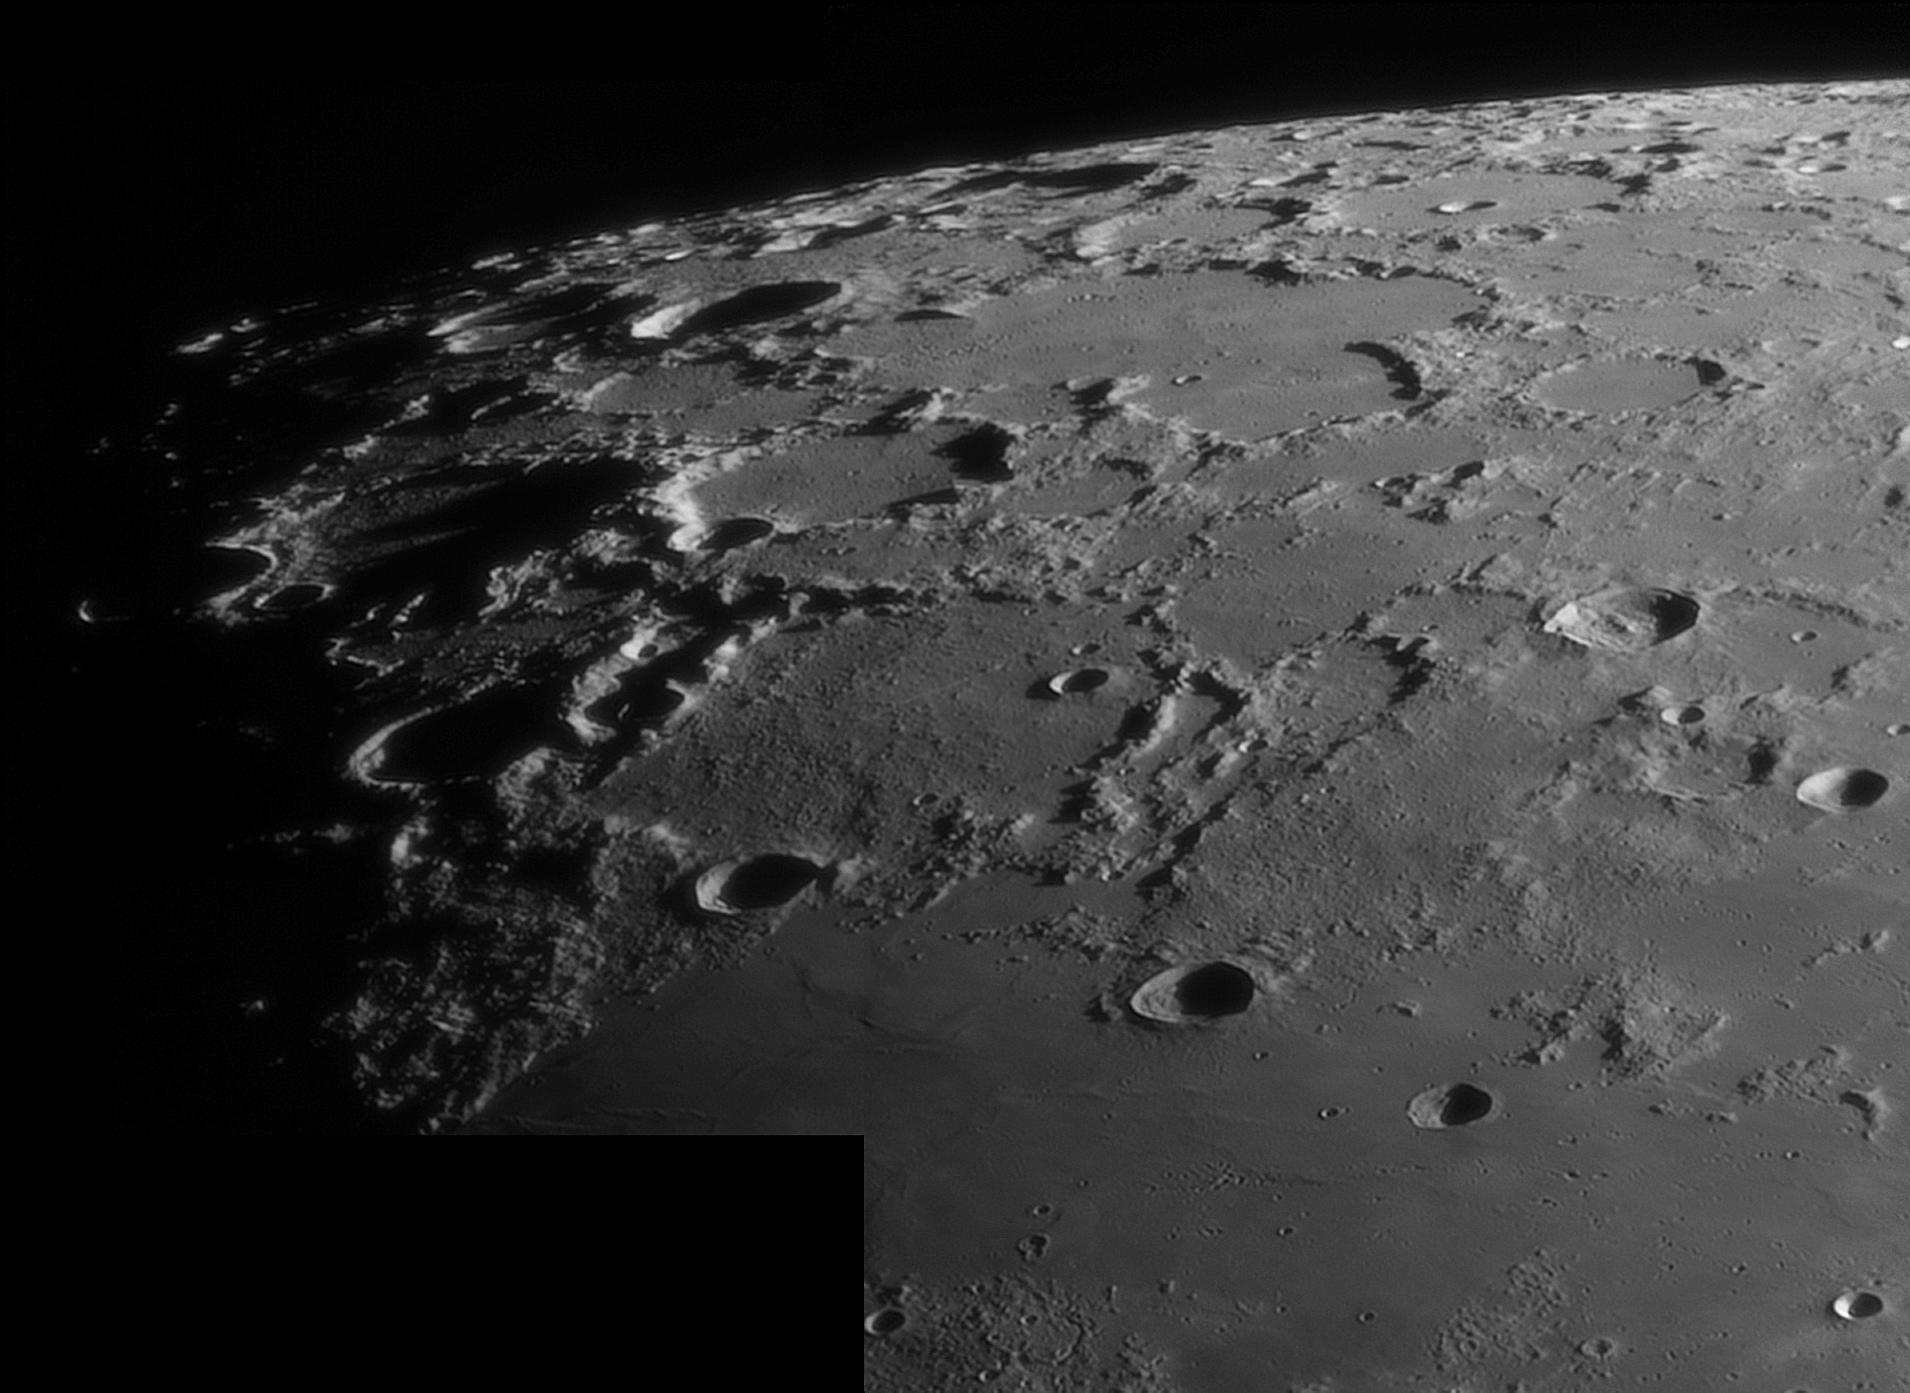 lune010320.jpg.bf00b701c4425e10093d47cdadb47efb.jpg